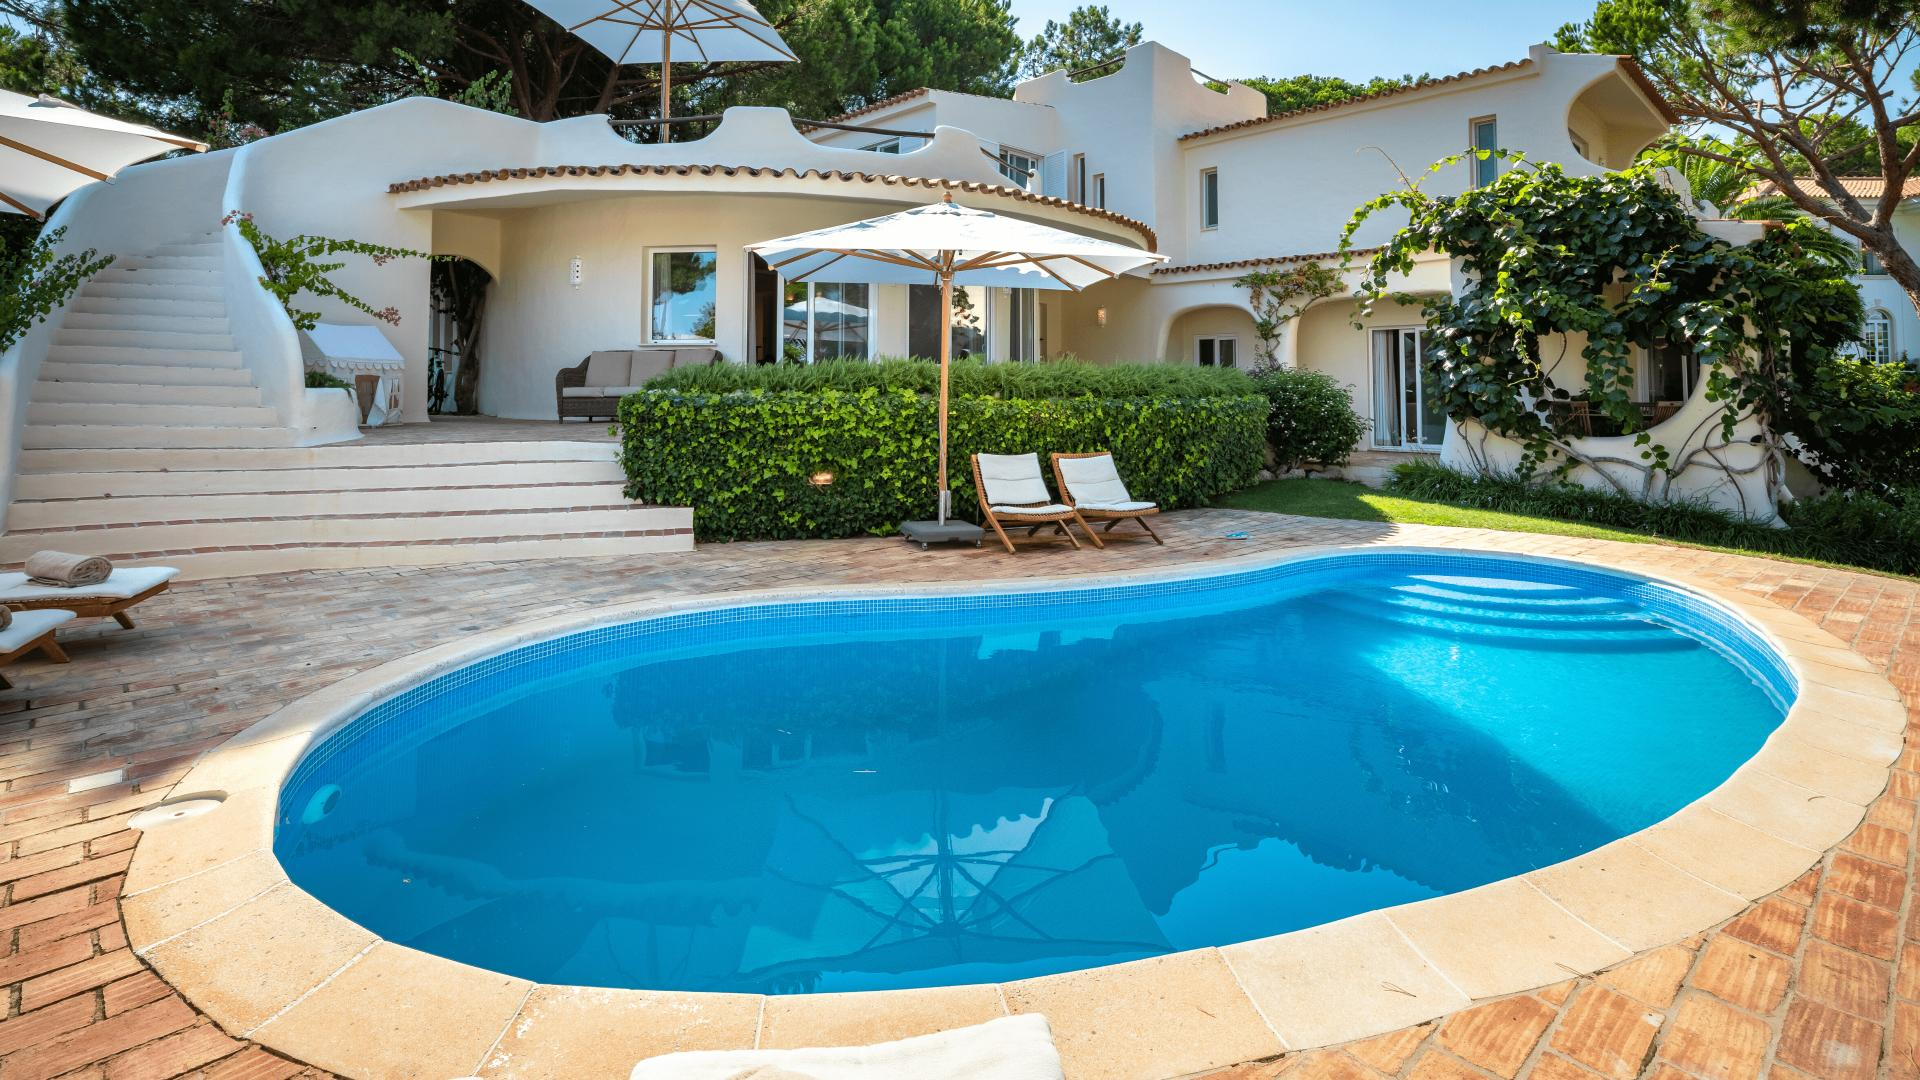 Casa Calhau - Valverde, Quinta do Lago, Algarve - Casa_Calhau_Poolside_1_1.png